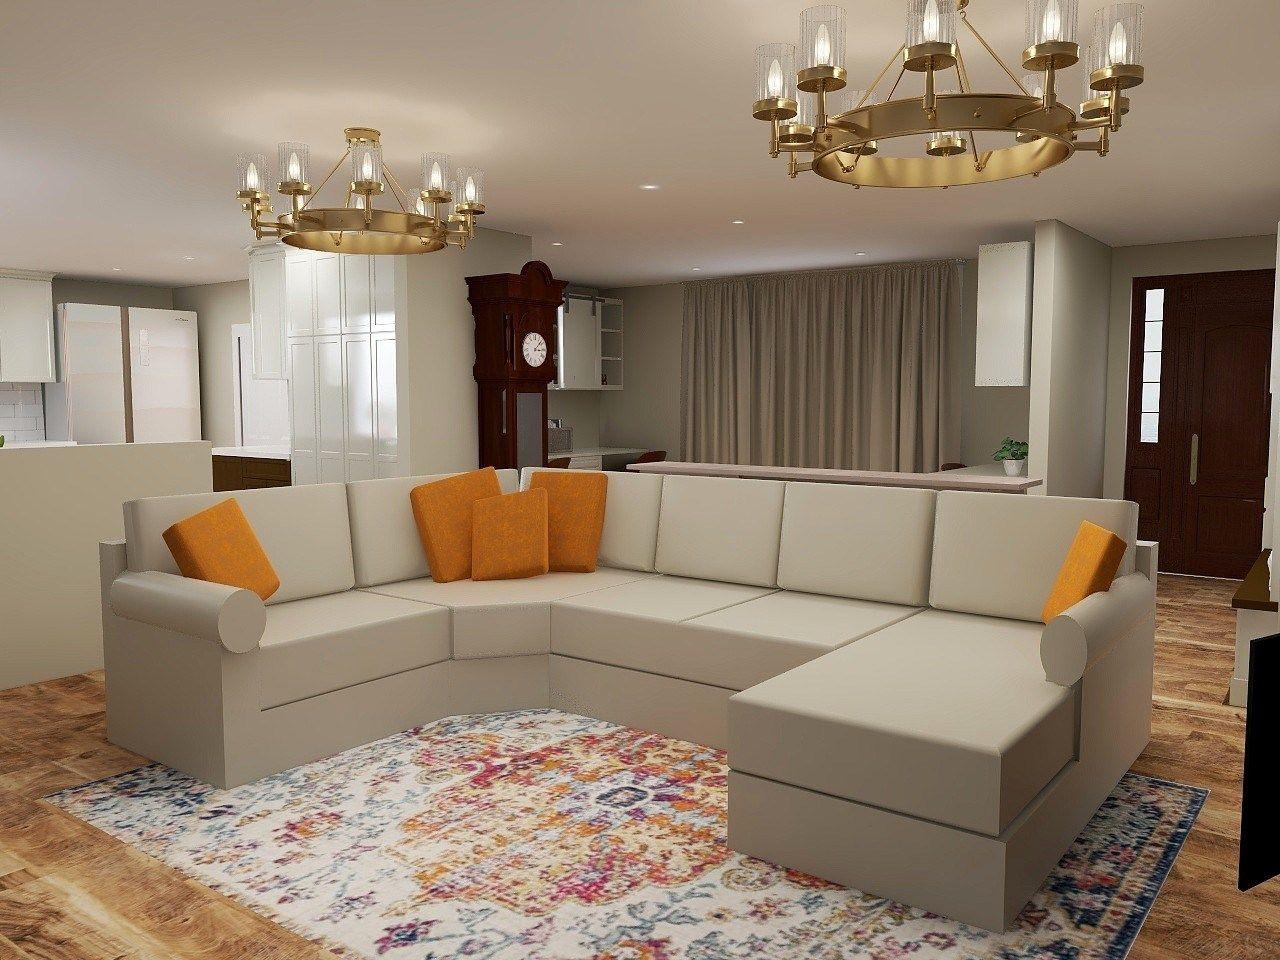 1970s ranch home renovation living room 3d renderings superior construction and design orange beige  chandeliers